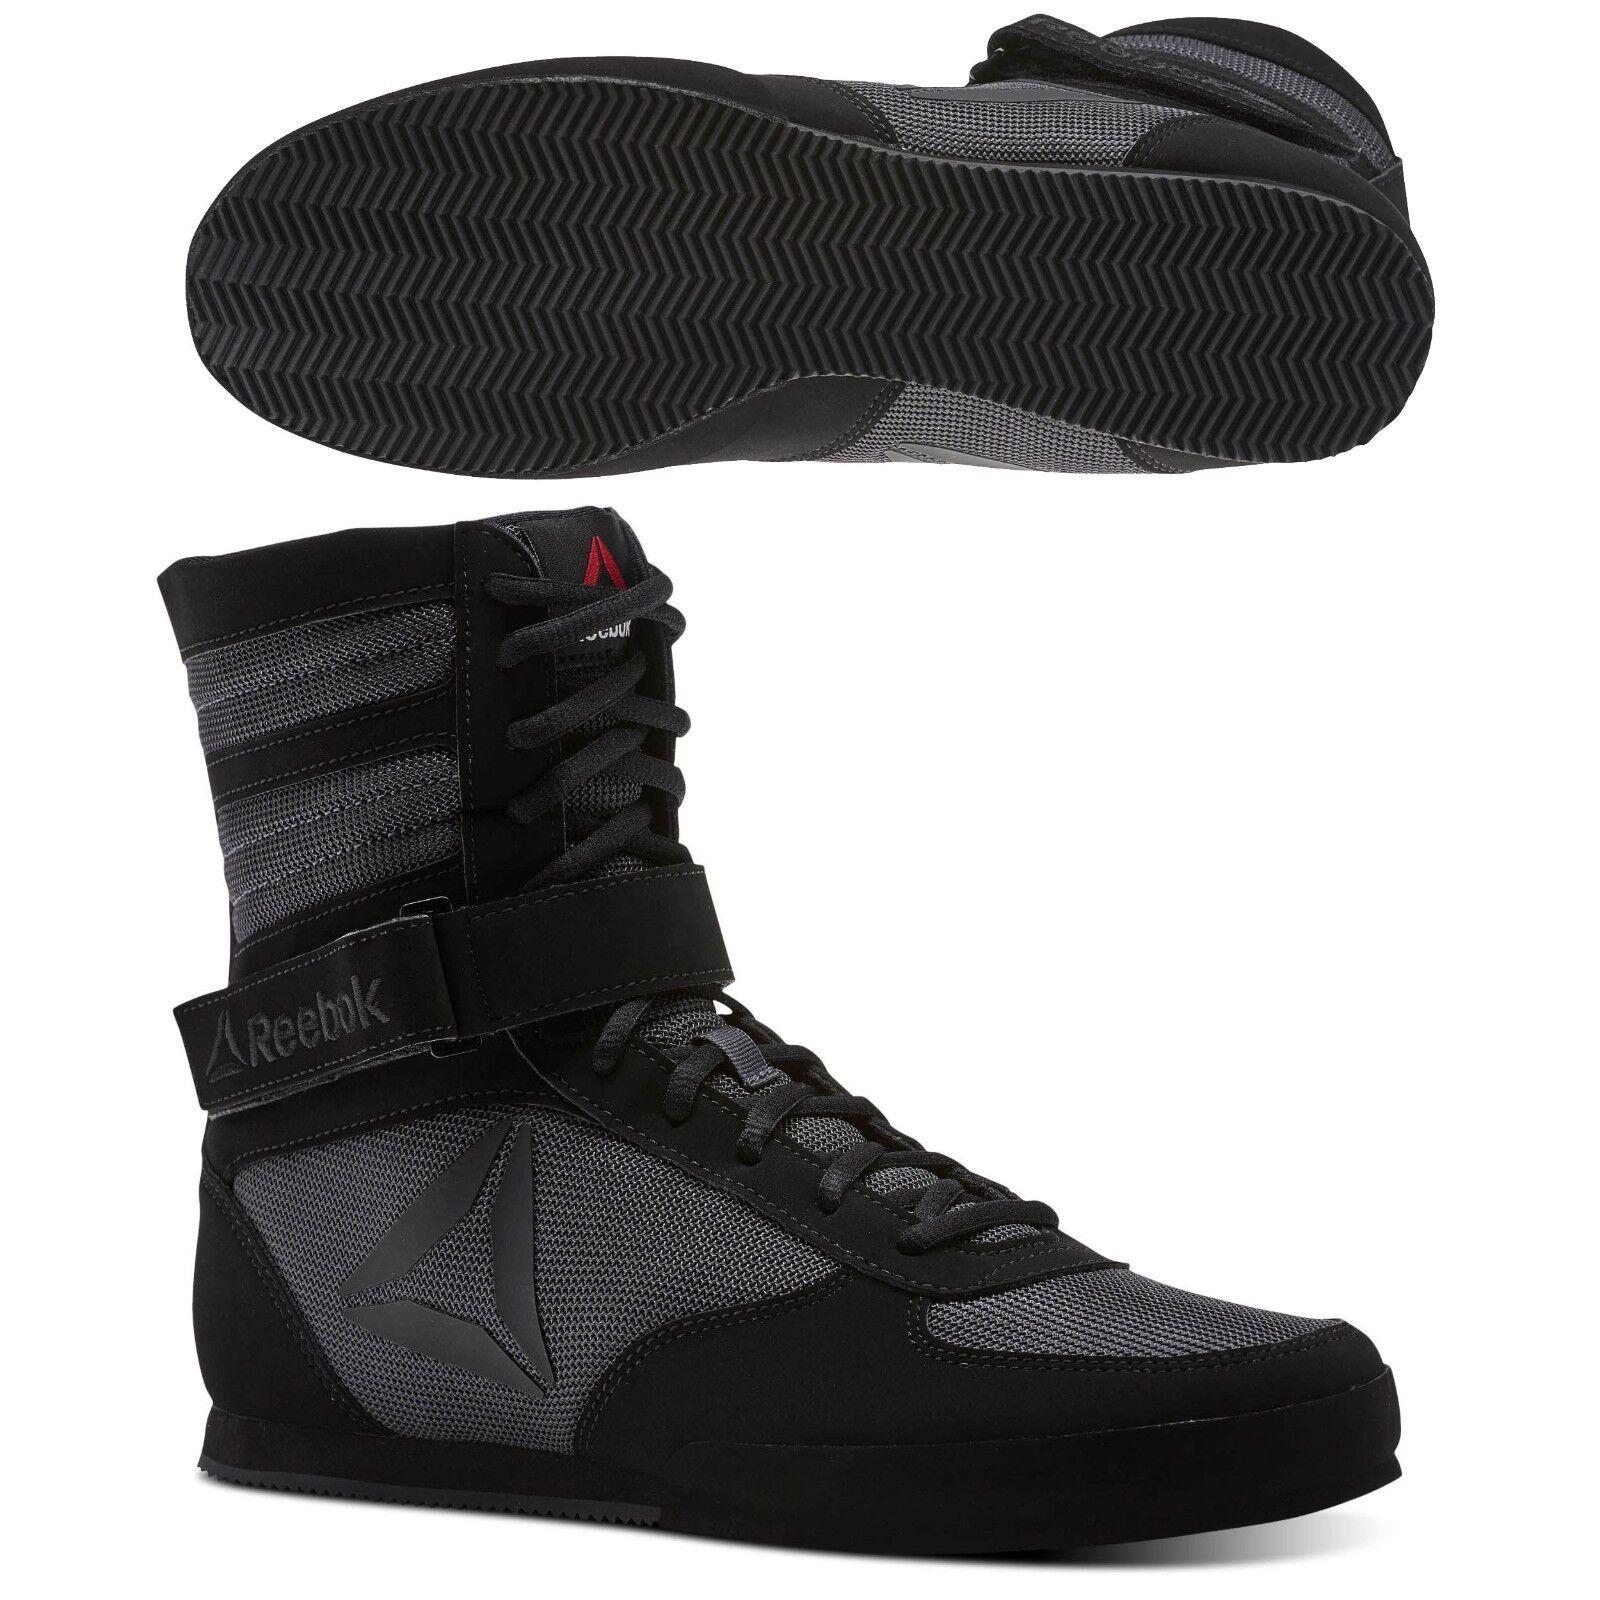 Reebok (UFC bota de boxeo cn0977 (UFC Reebok   caja) 8b2061